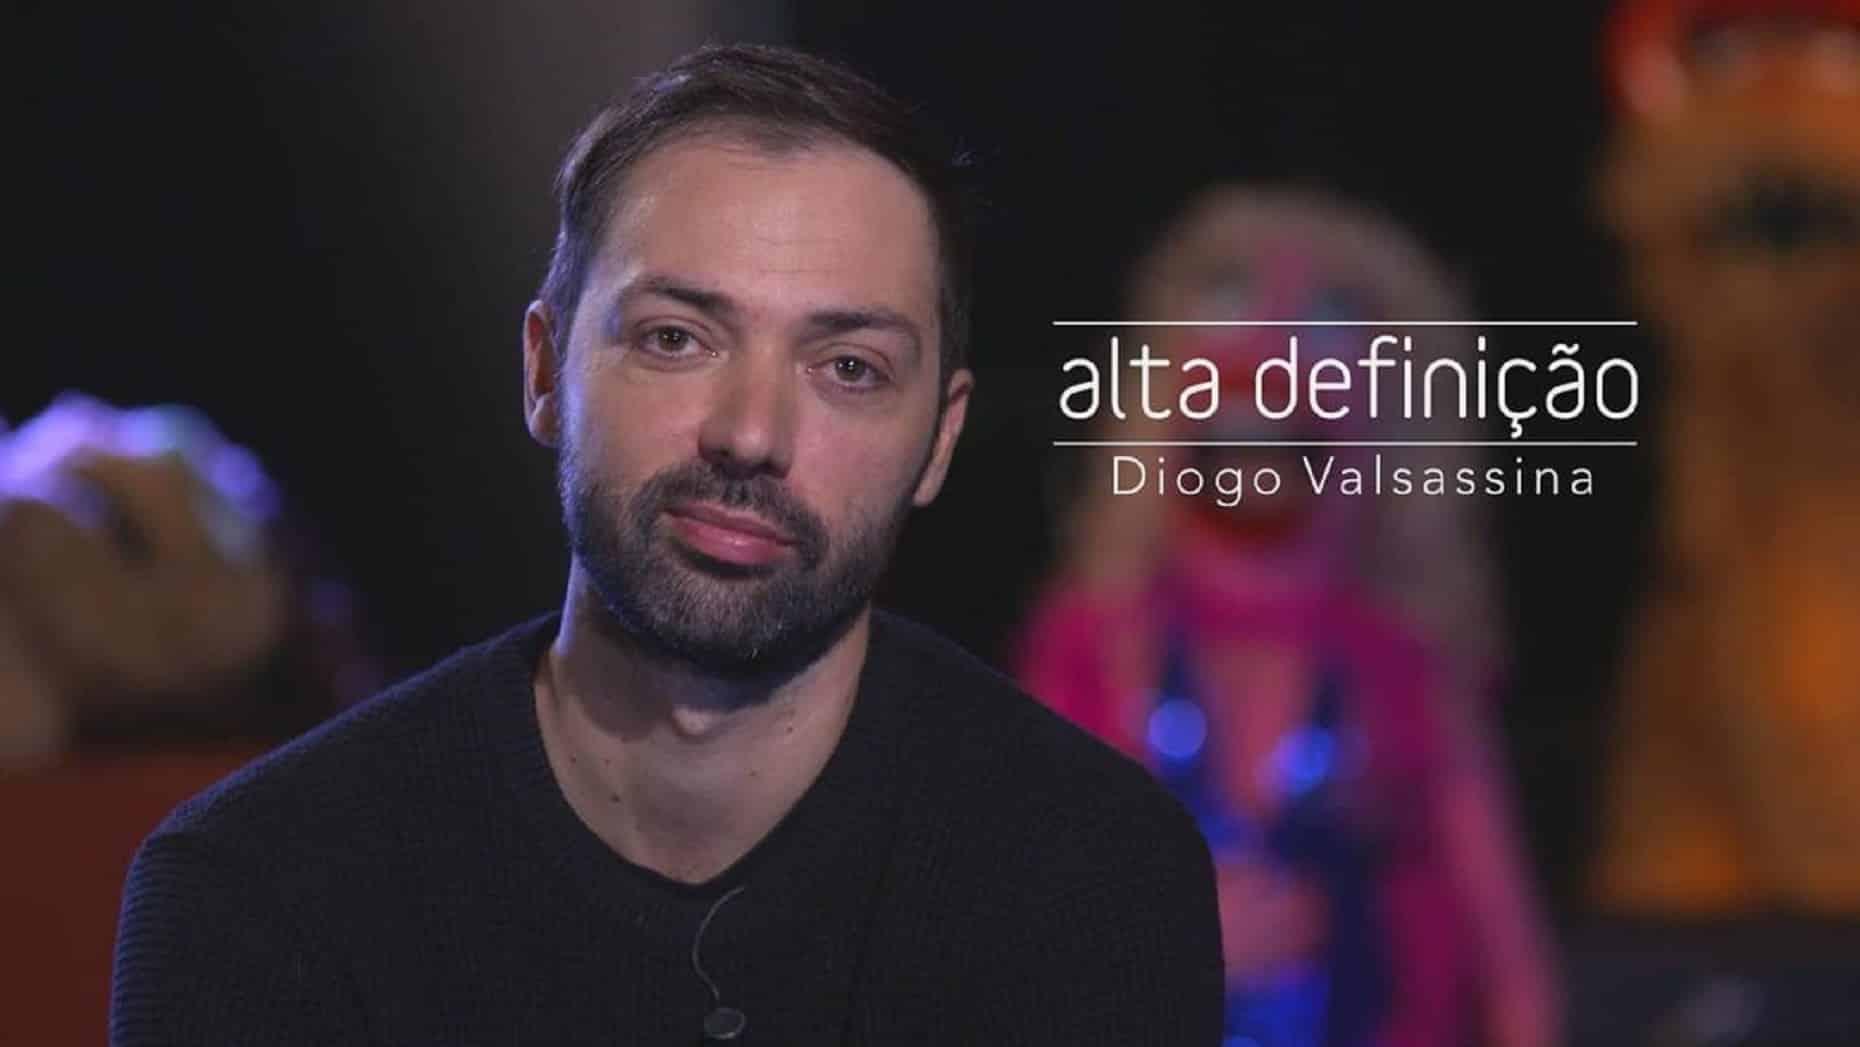 Diogo Valsassina